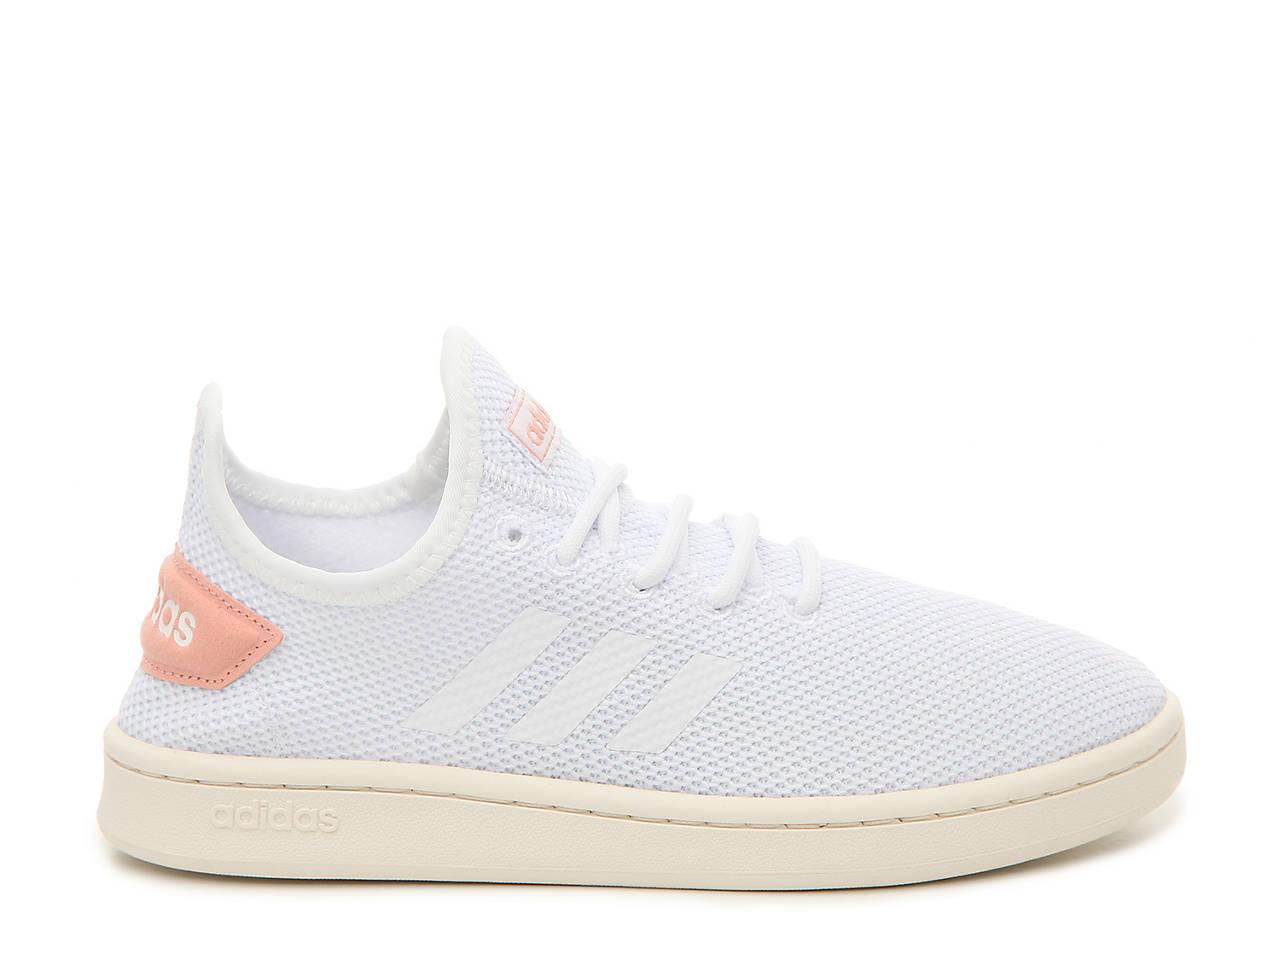 041ebf38fef0 adidas Court Adapt Sneaker - Women s Women s Shoes